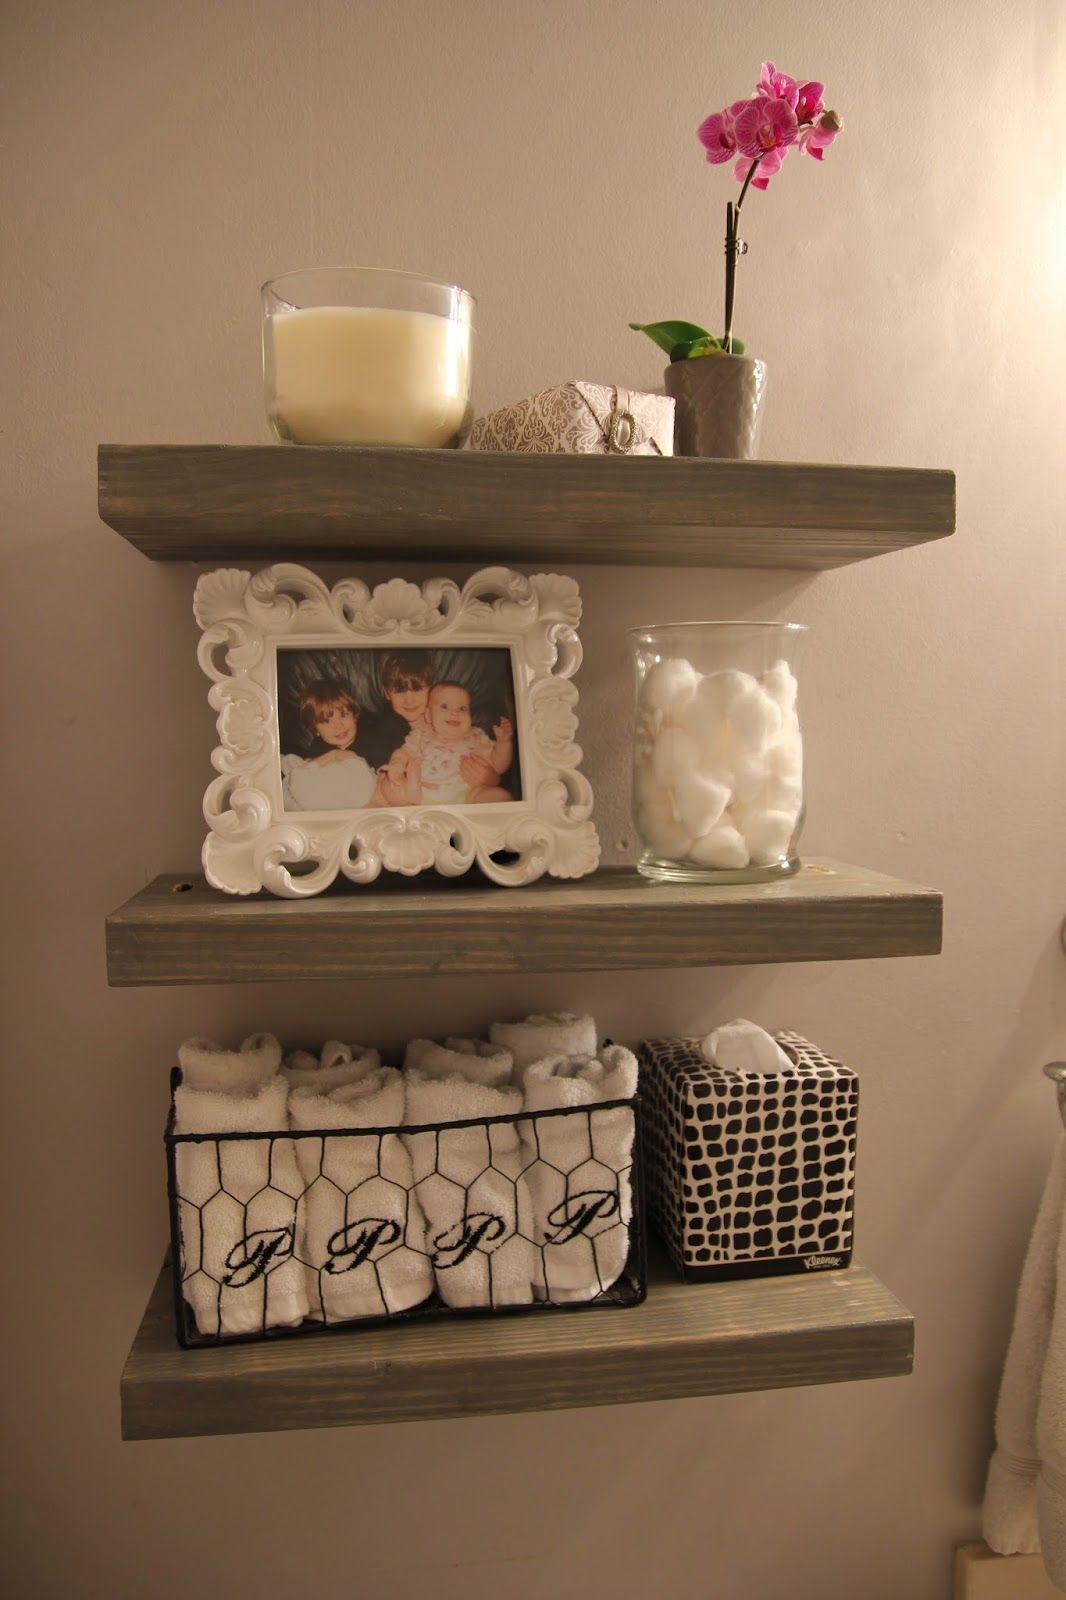 Diy Weathered Gray Floating Shelves Floating Shelves Reclaimed Wood Floating Shelves Wood Floating Shelves